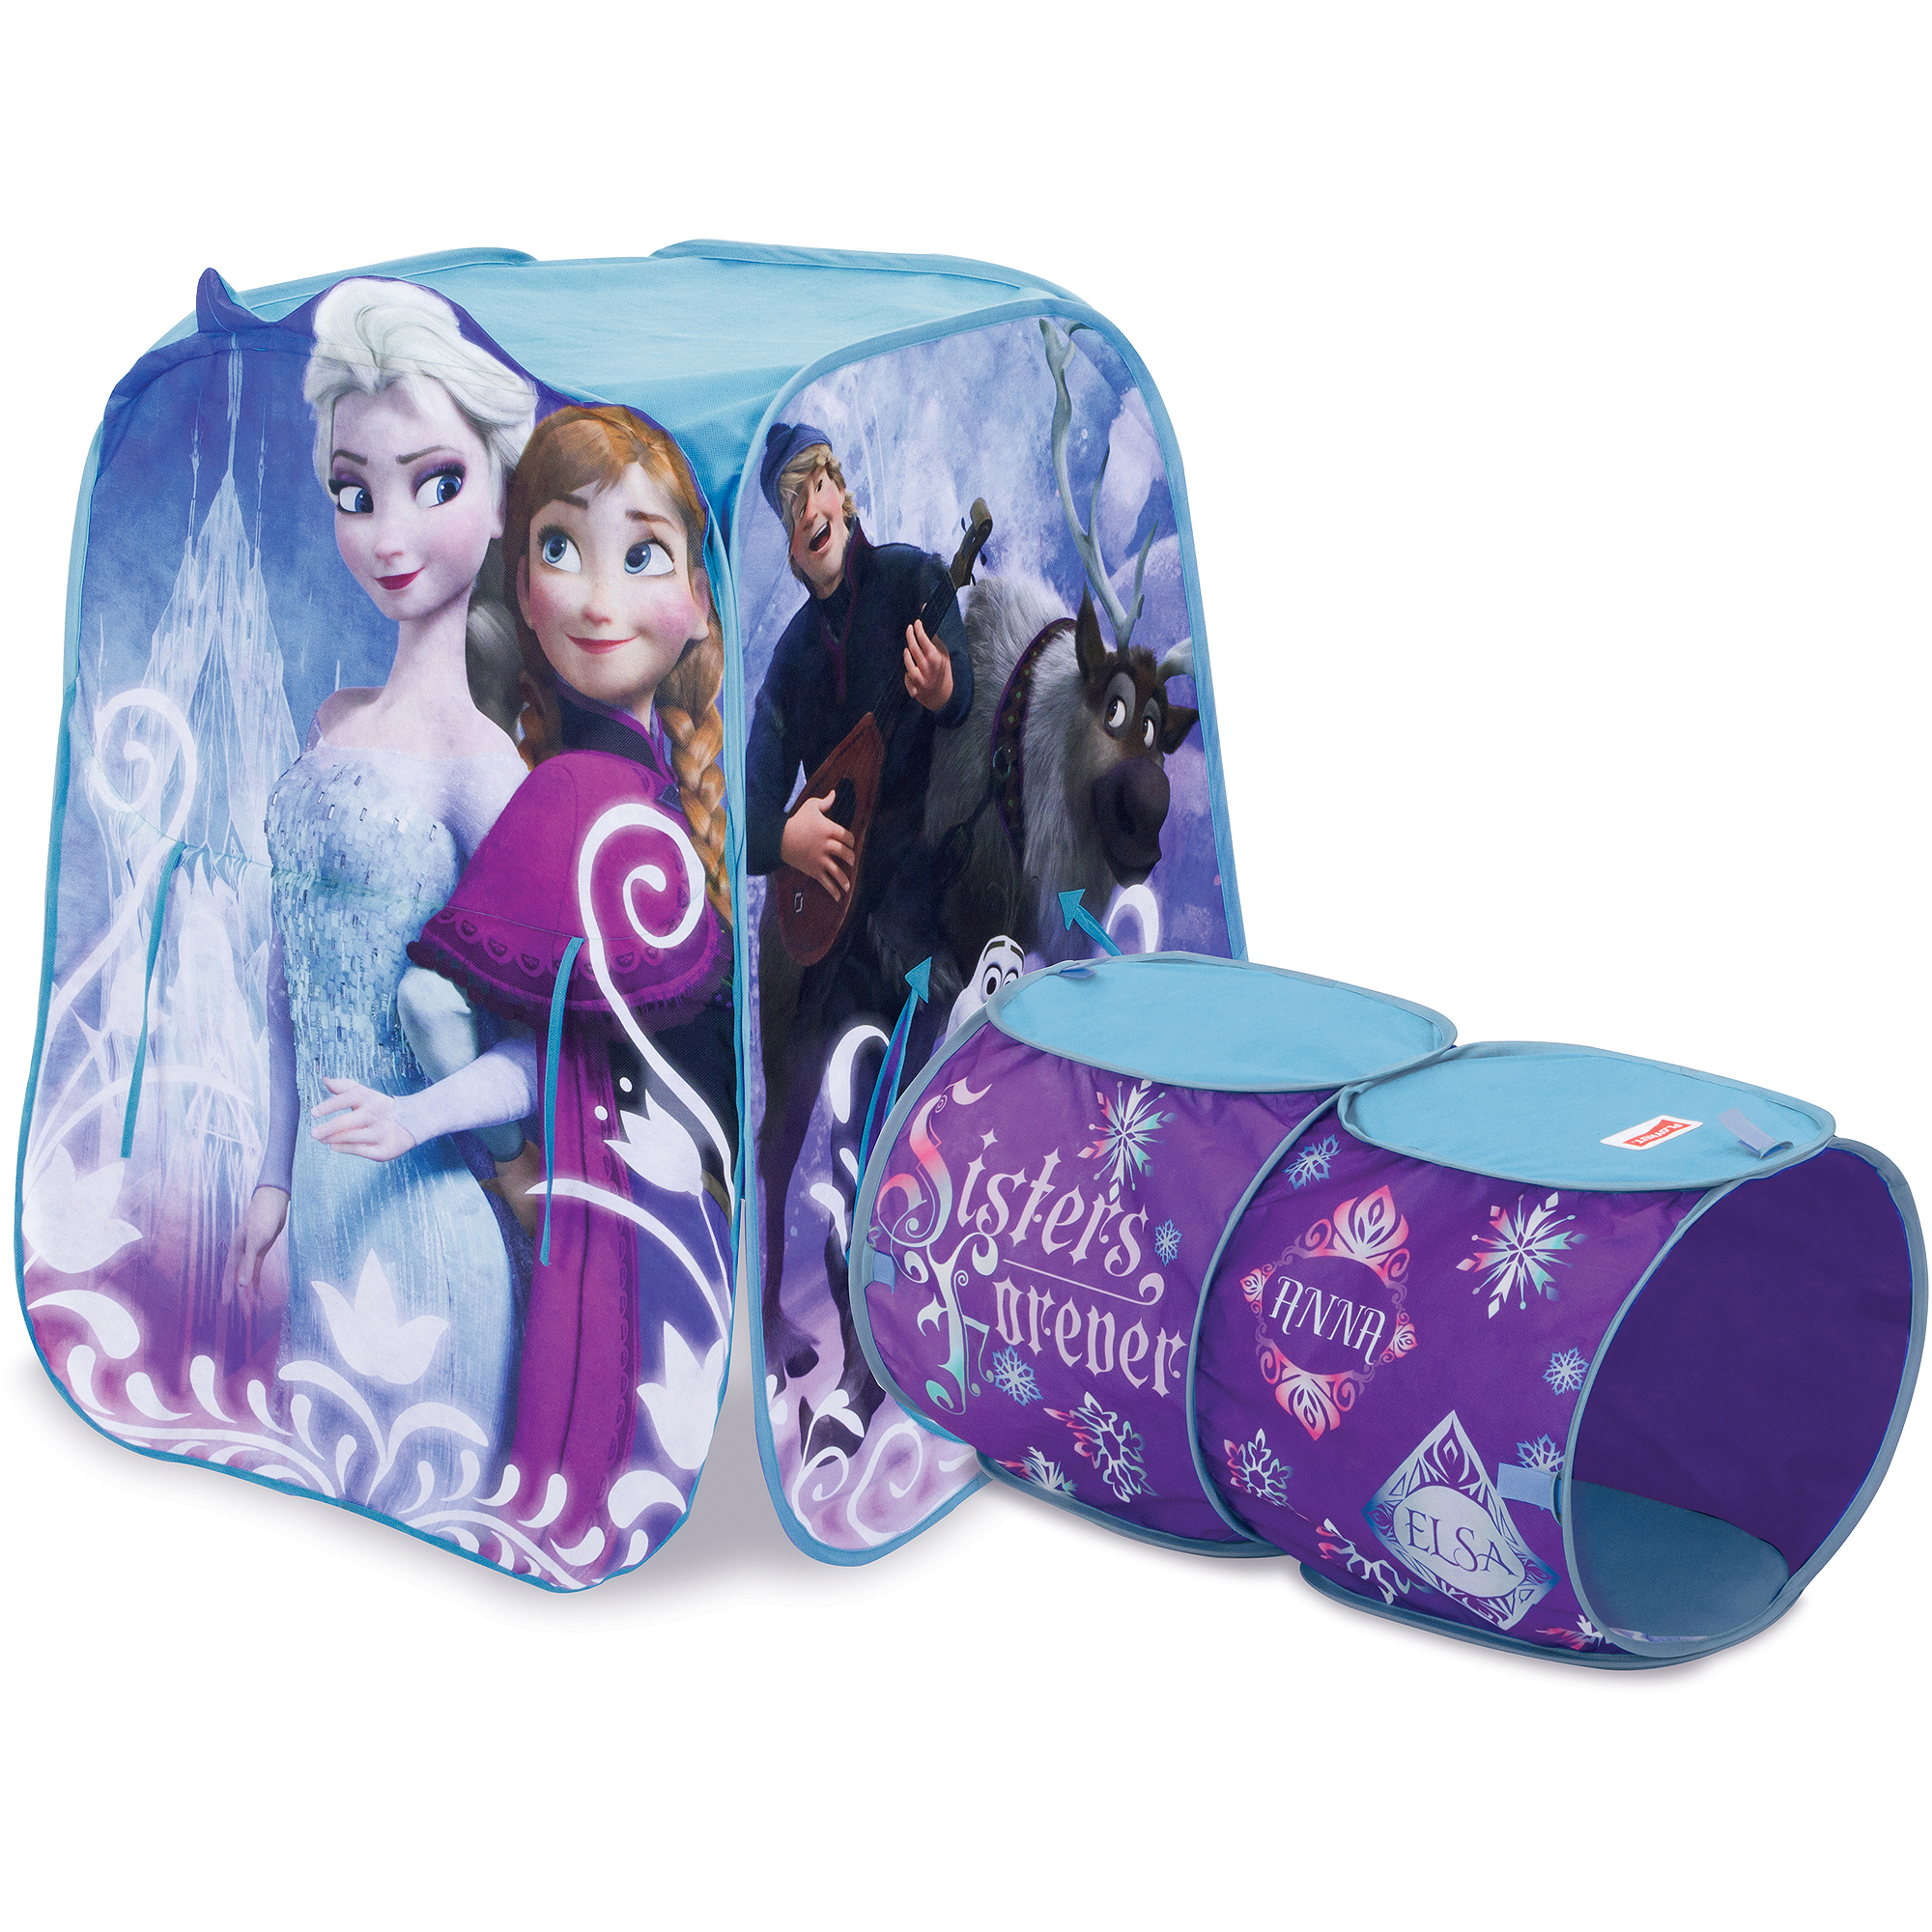 sc 1 st  Walmart & Disney Frozen Discovery Hut Play Tent - Walmart.com